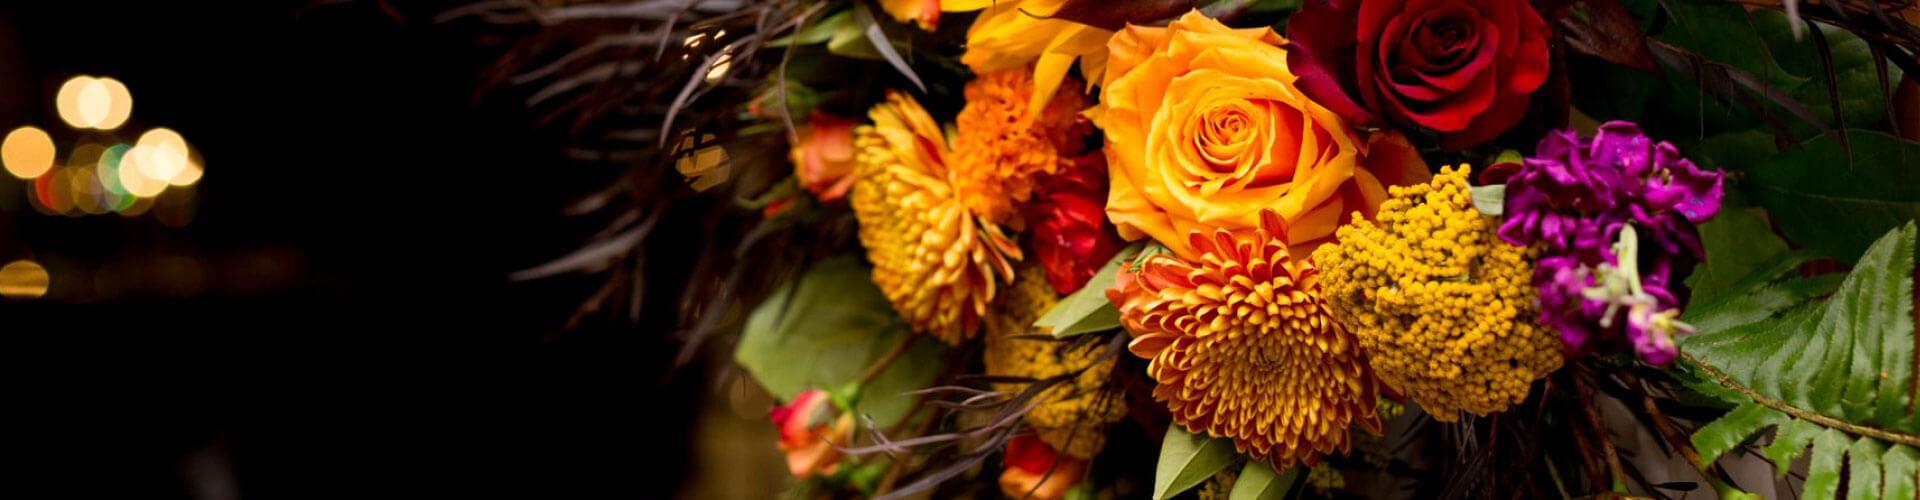 floral-page-hero-desktop